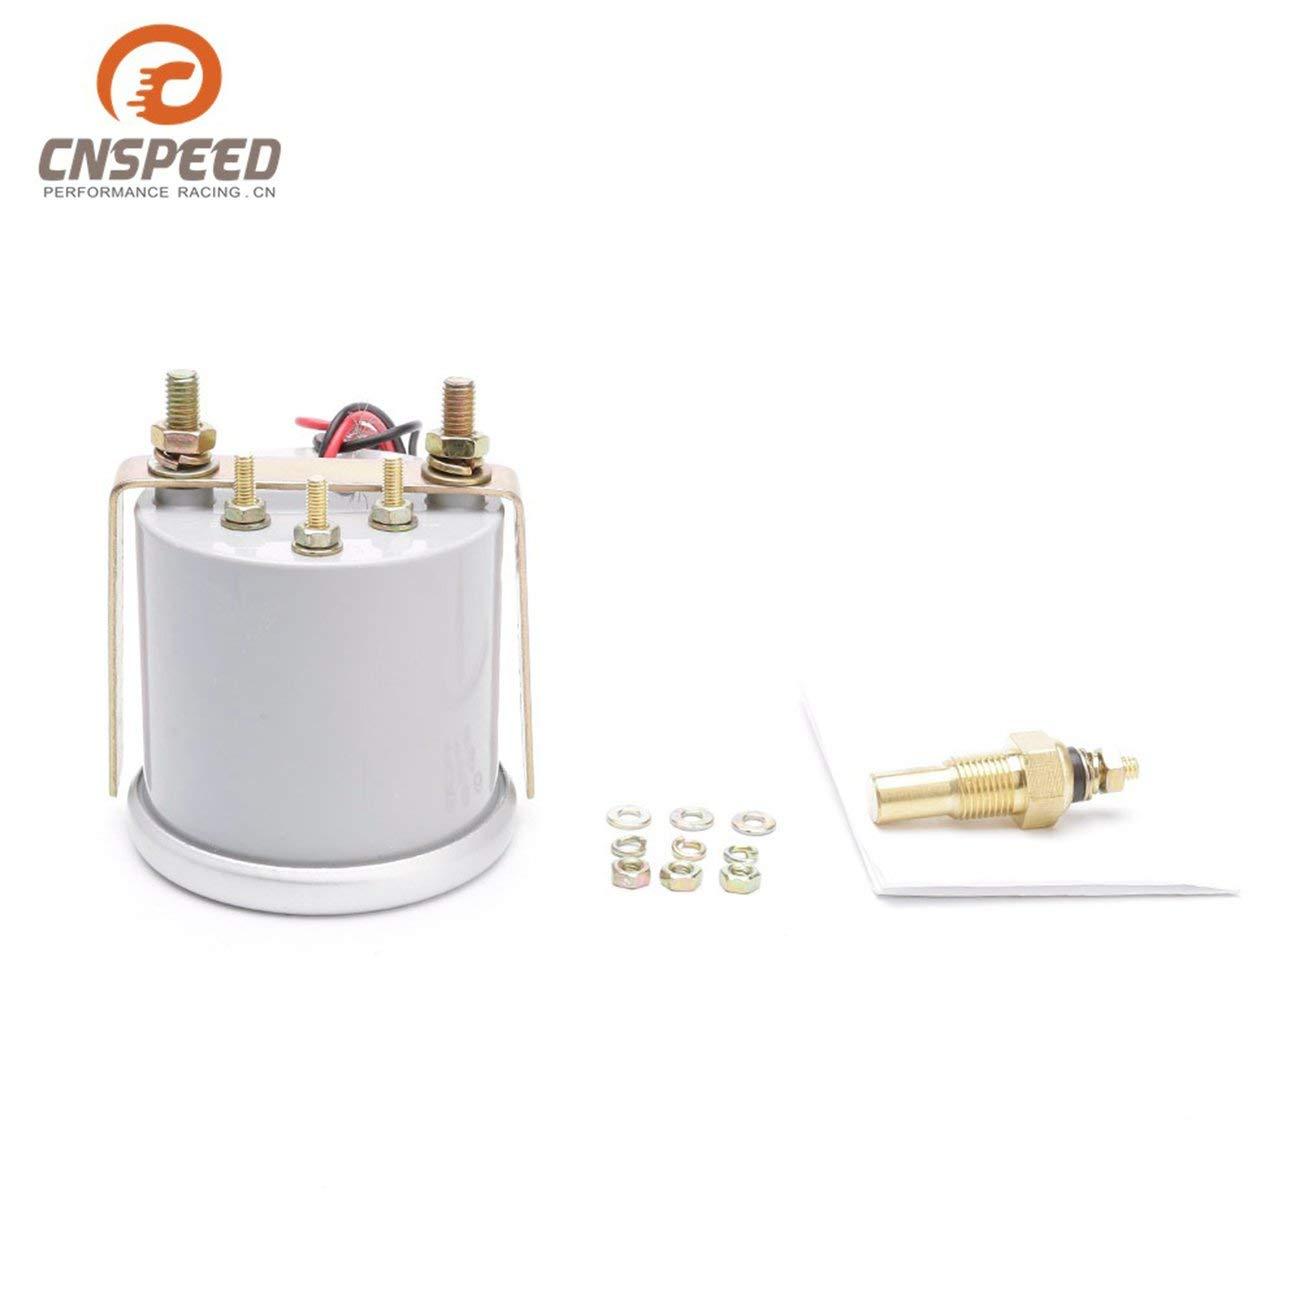 Elviray Led Digital Wassertemperaturmesser Thermometer 52 Mm Rauch Objektiv Gm Auto Modifikation